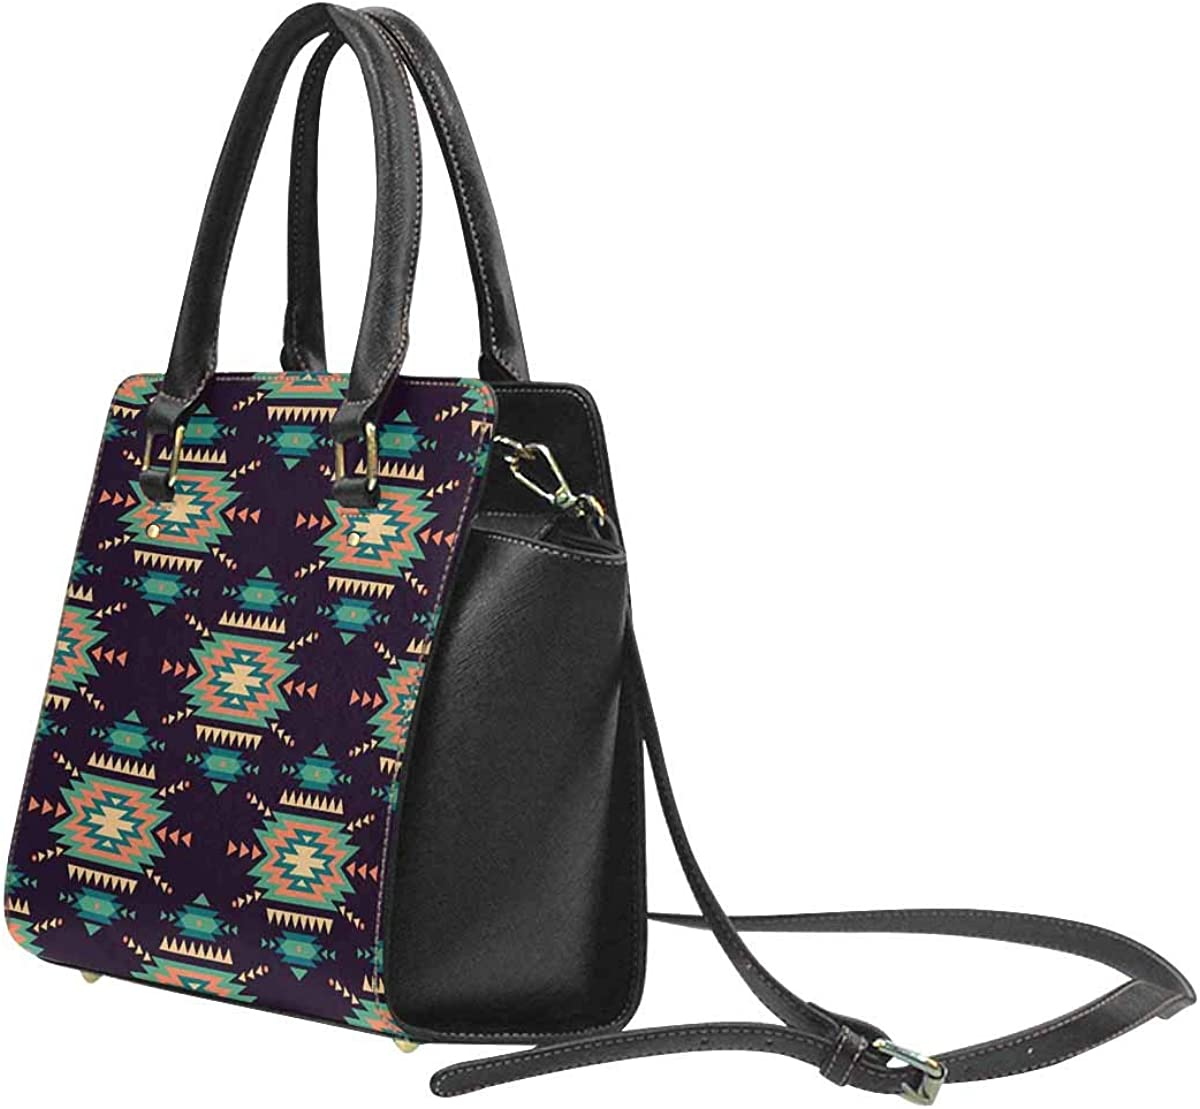 Tote Bag Patricks Day PU Leather Classic Shoulder Handbag INTERESTPRINT St